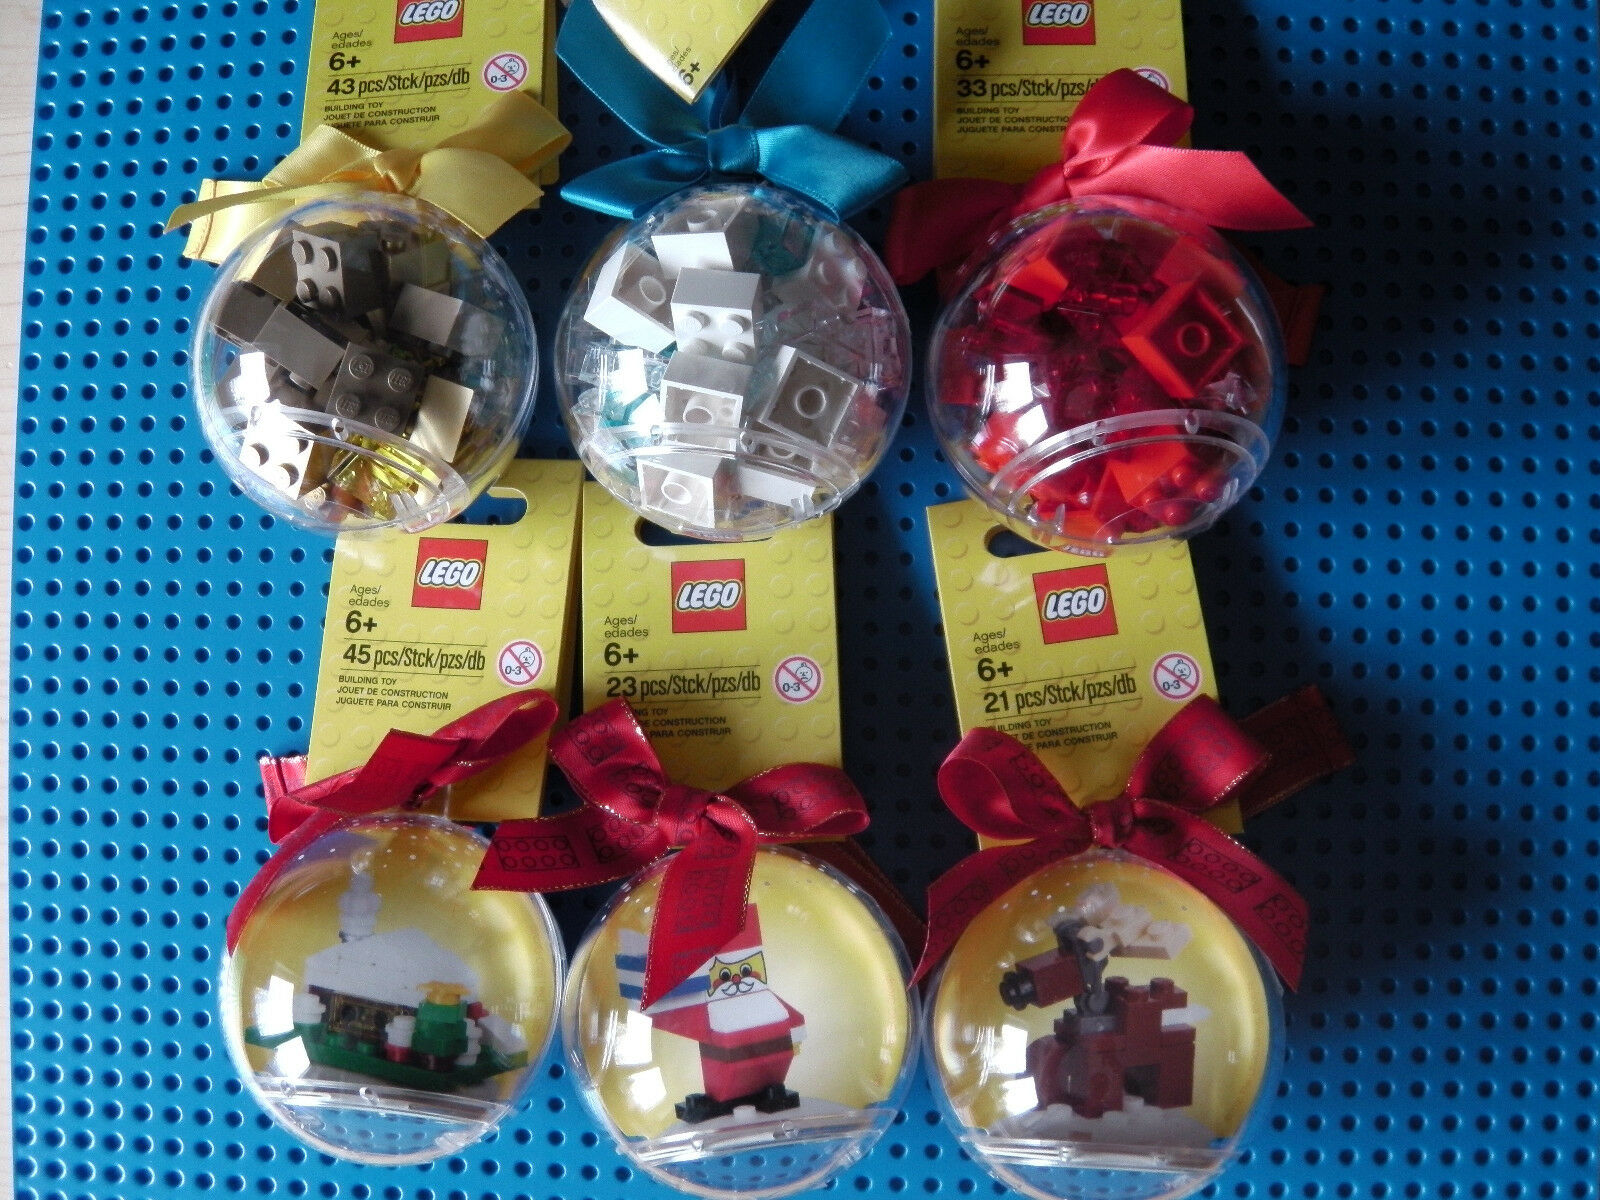 LEGO® 6 x Christbaumkugeln 850850 850949 851358 853344 853345 853574 X-MAS Neu